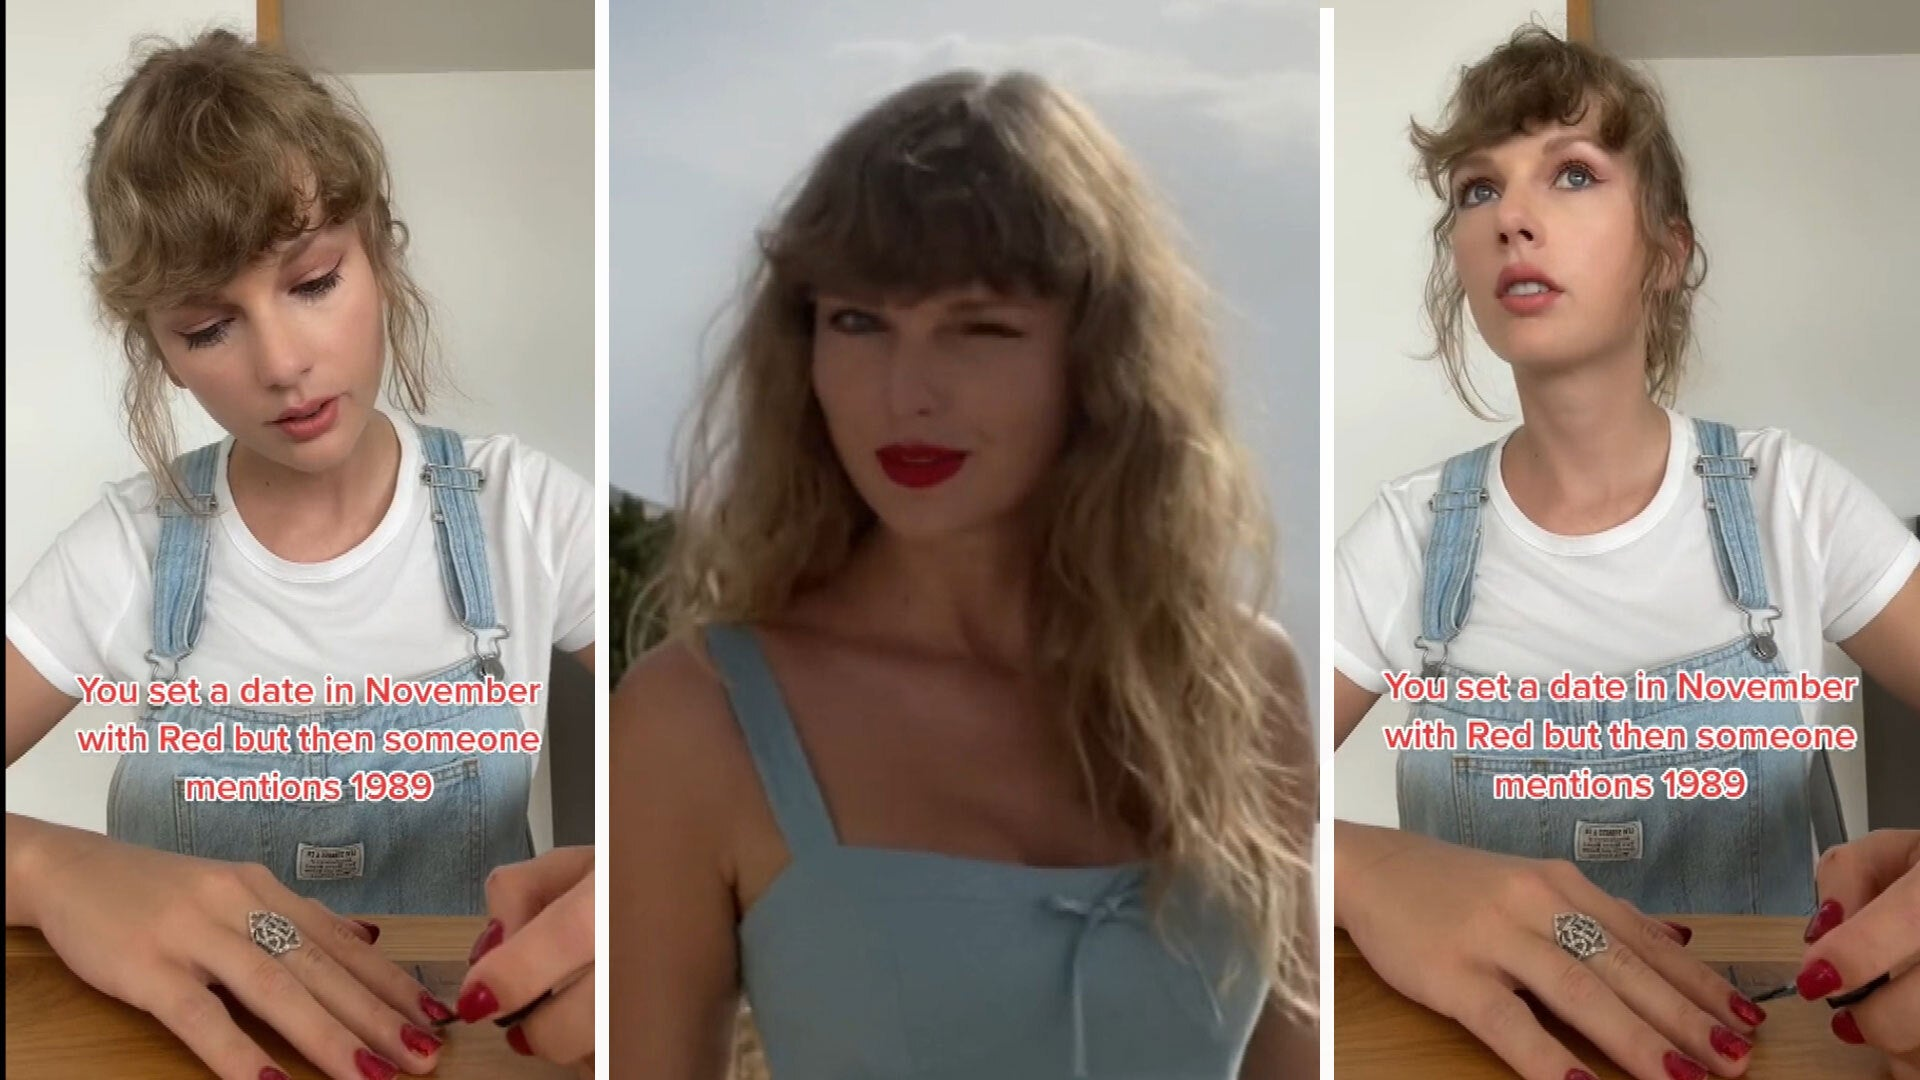 Taylor Swift Does 'Wildest Dreams' TikTok Trend